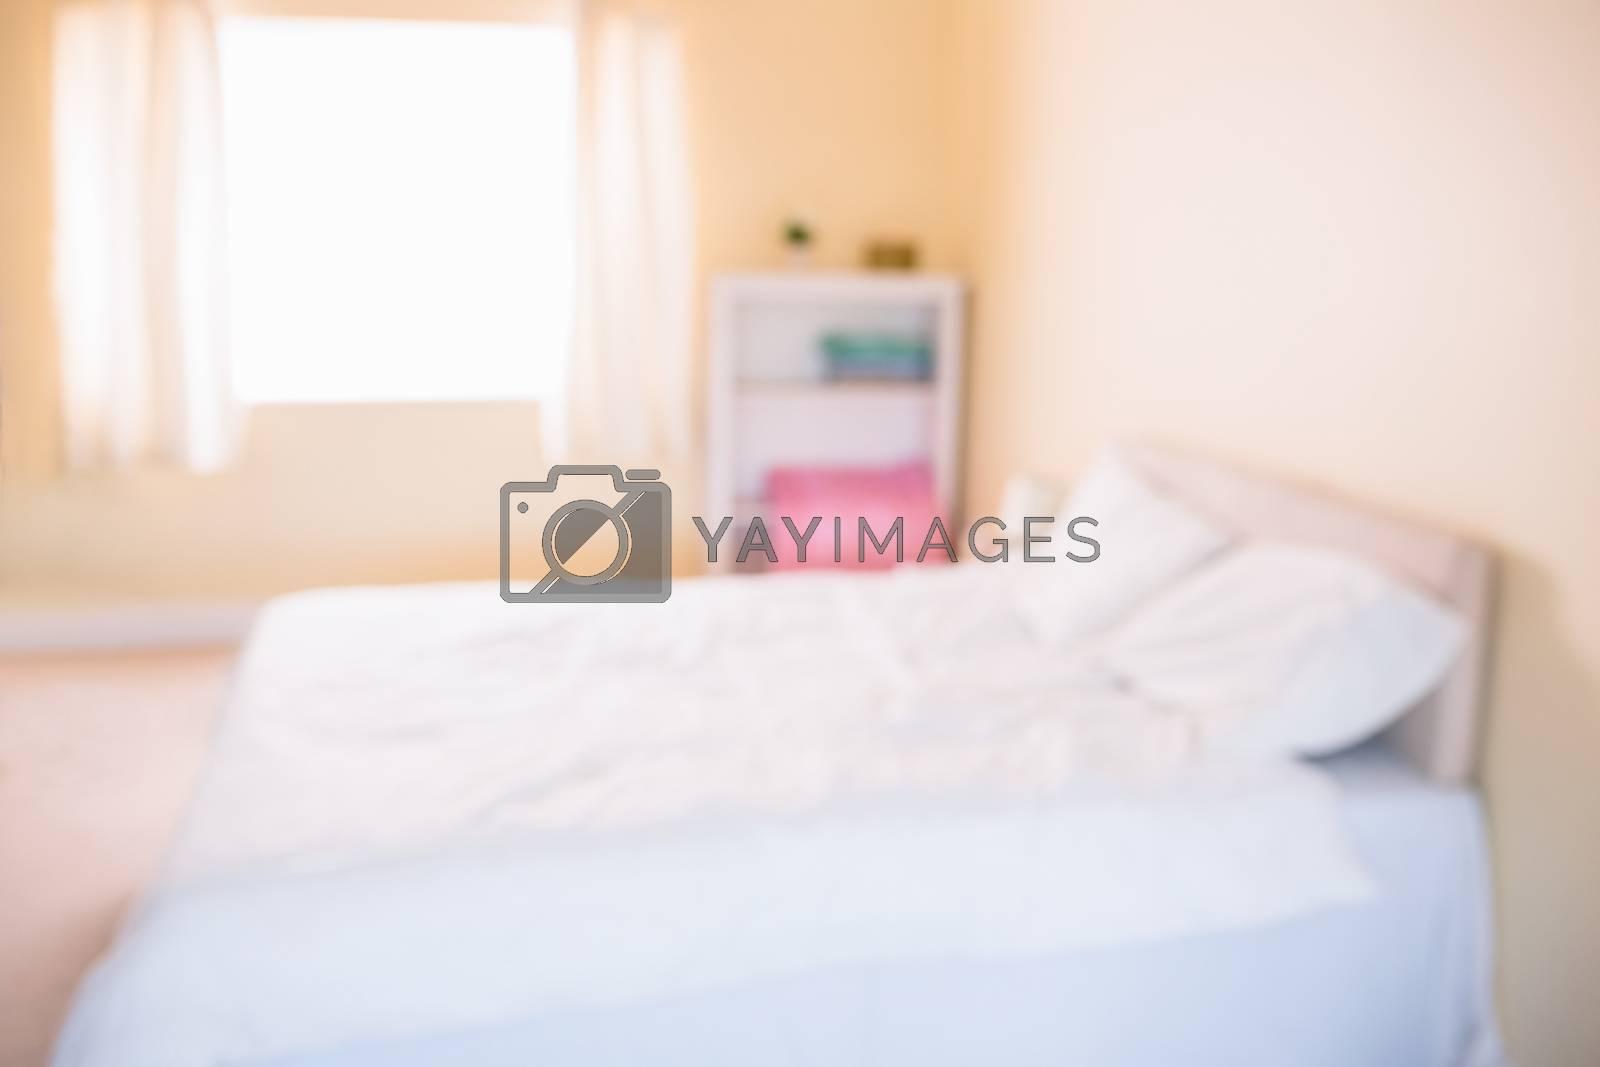 Royalty free image of Fuzzy image of pregnancy bedroom  by Wavebreakmedia